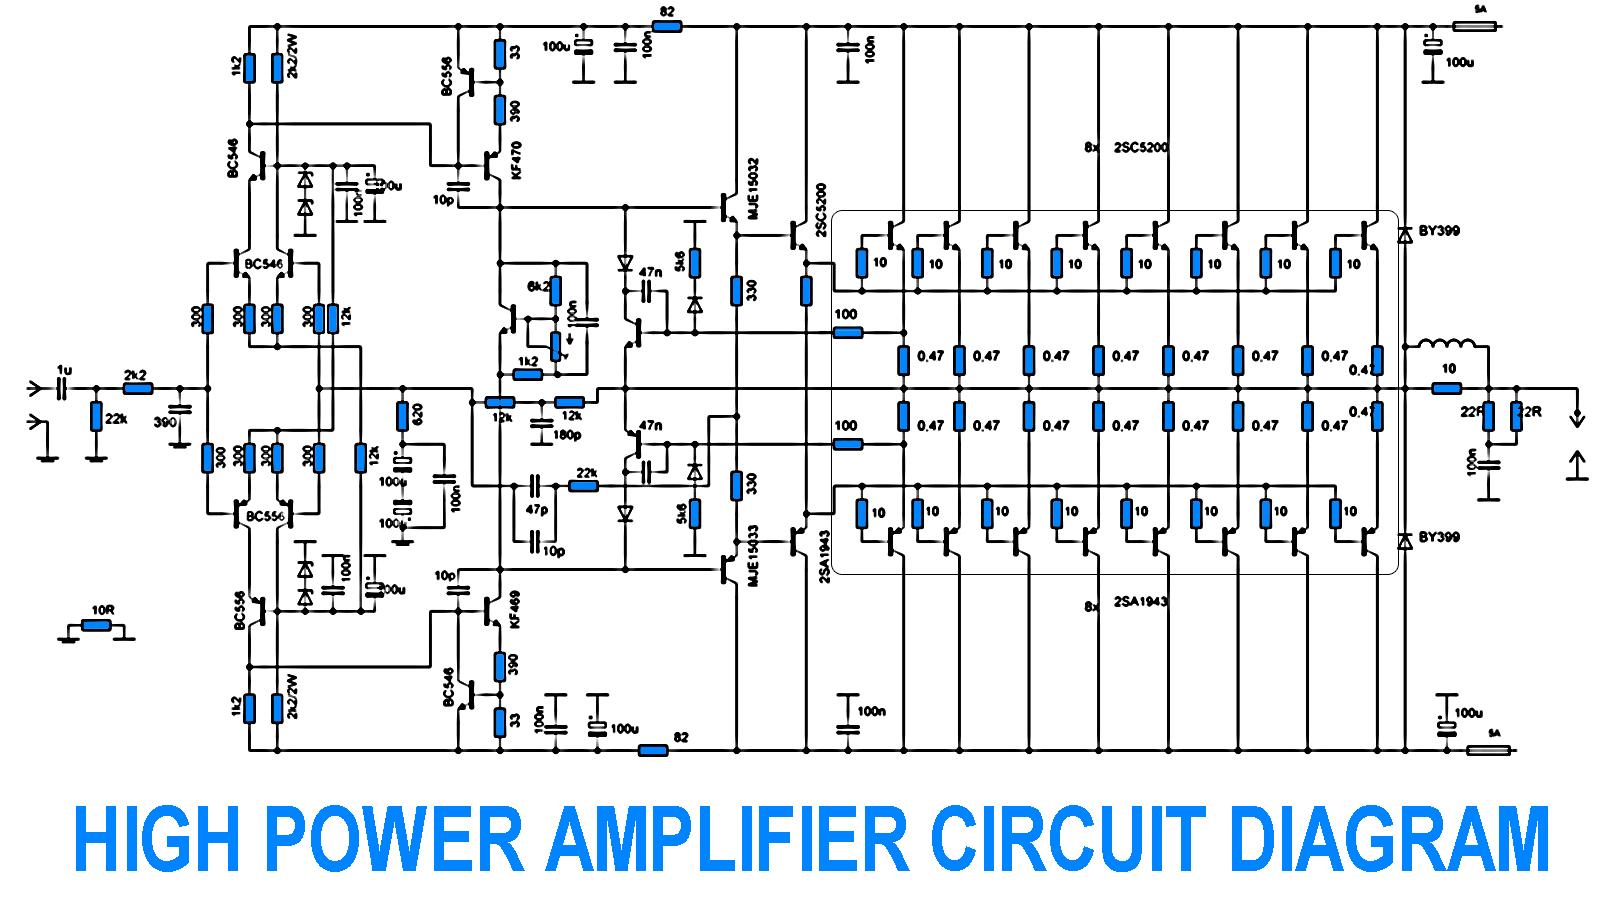 2000w Power Amplifier Circuit Diagrams Wiring Diagram 100w Mosfet D Rudiant Pioneer Rh Wirerudian Blogspot Com Datasheet